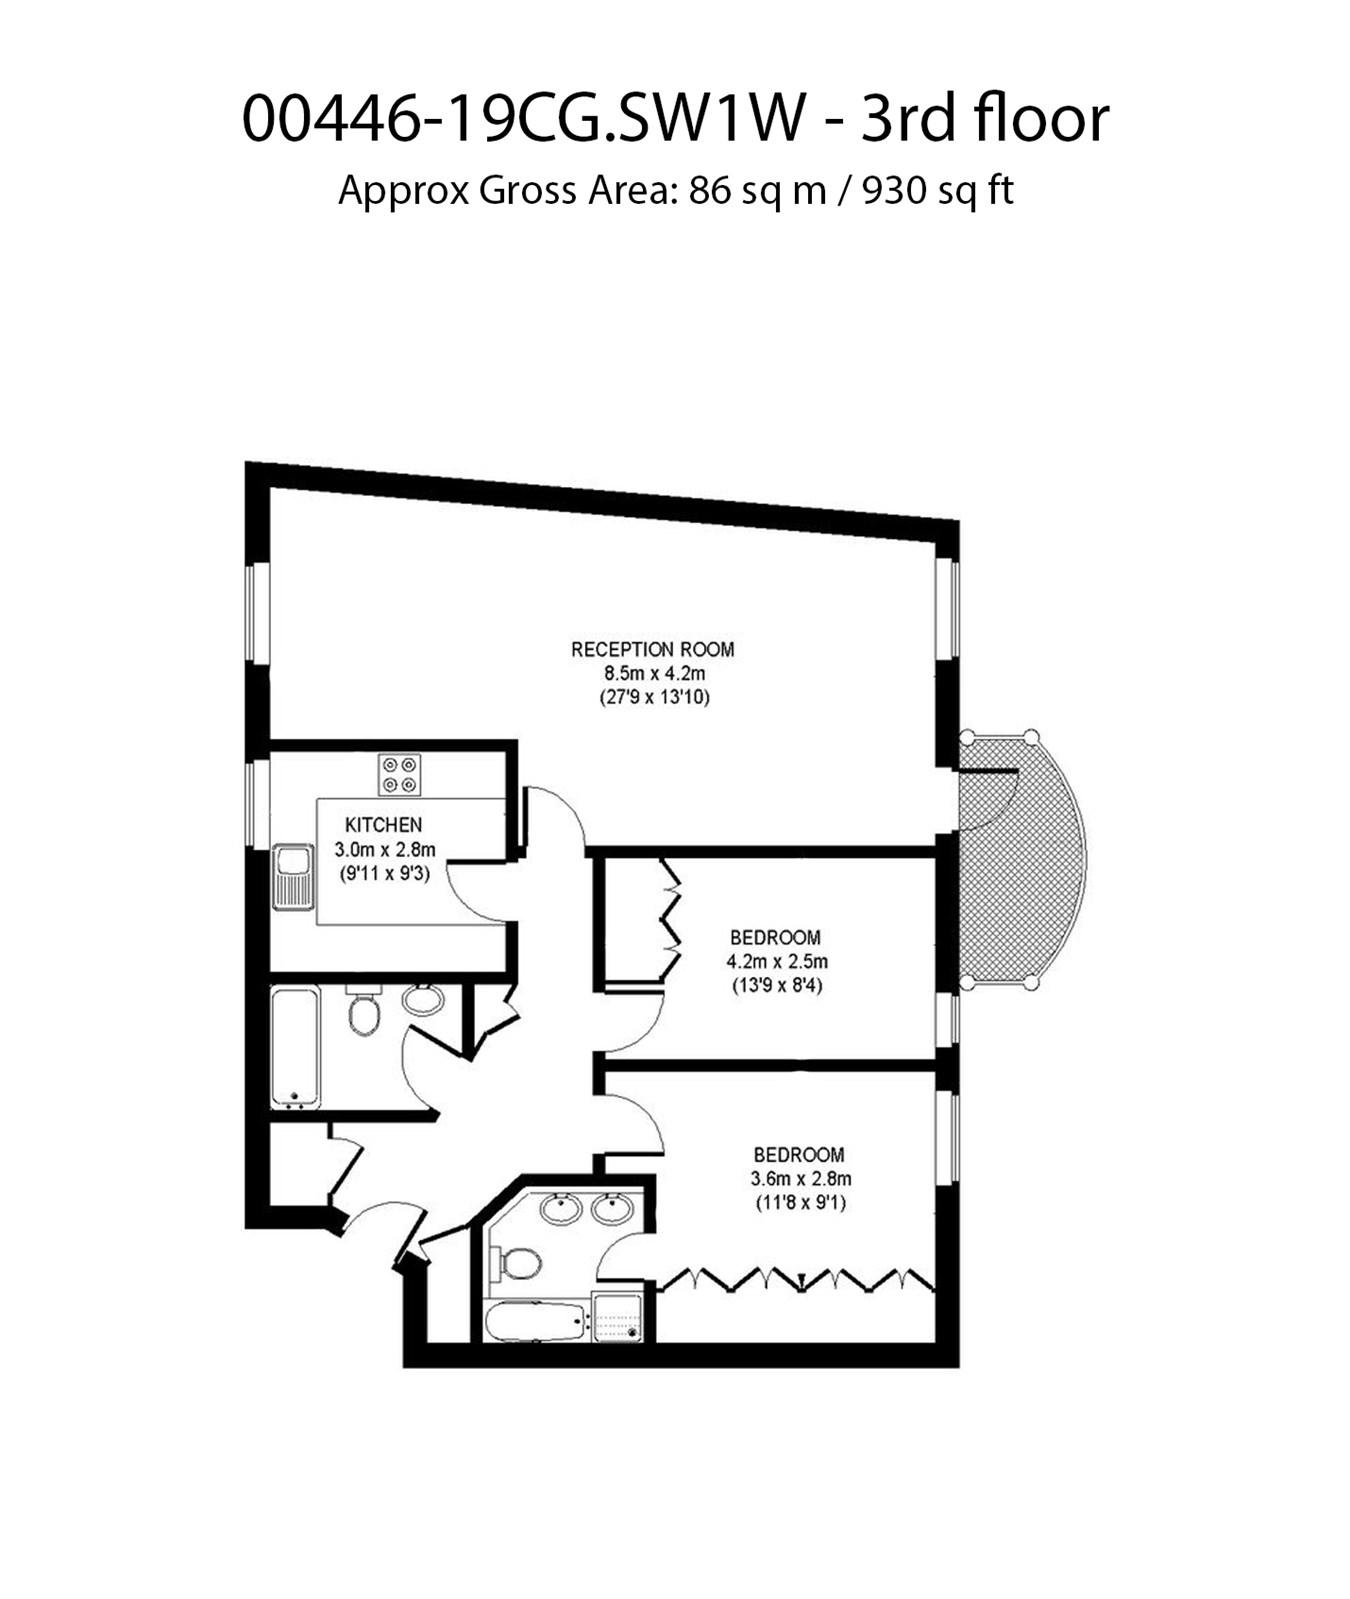 Chelsea Gate Apartments, 93 Ebury Bridge Road, London SW1W